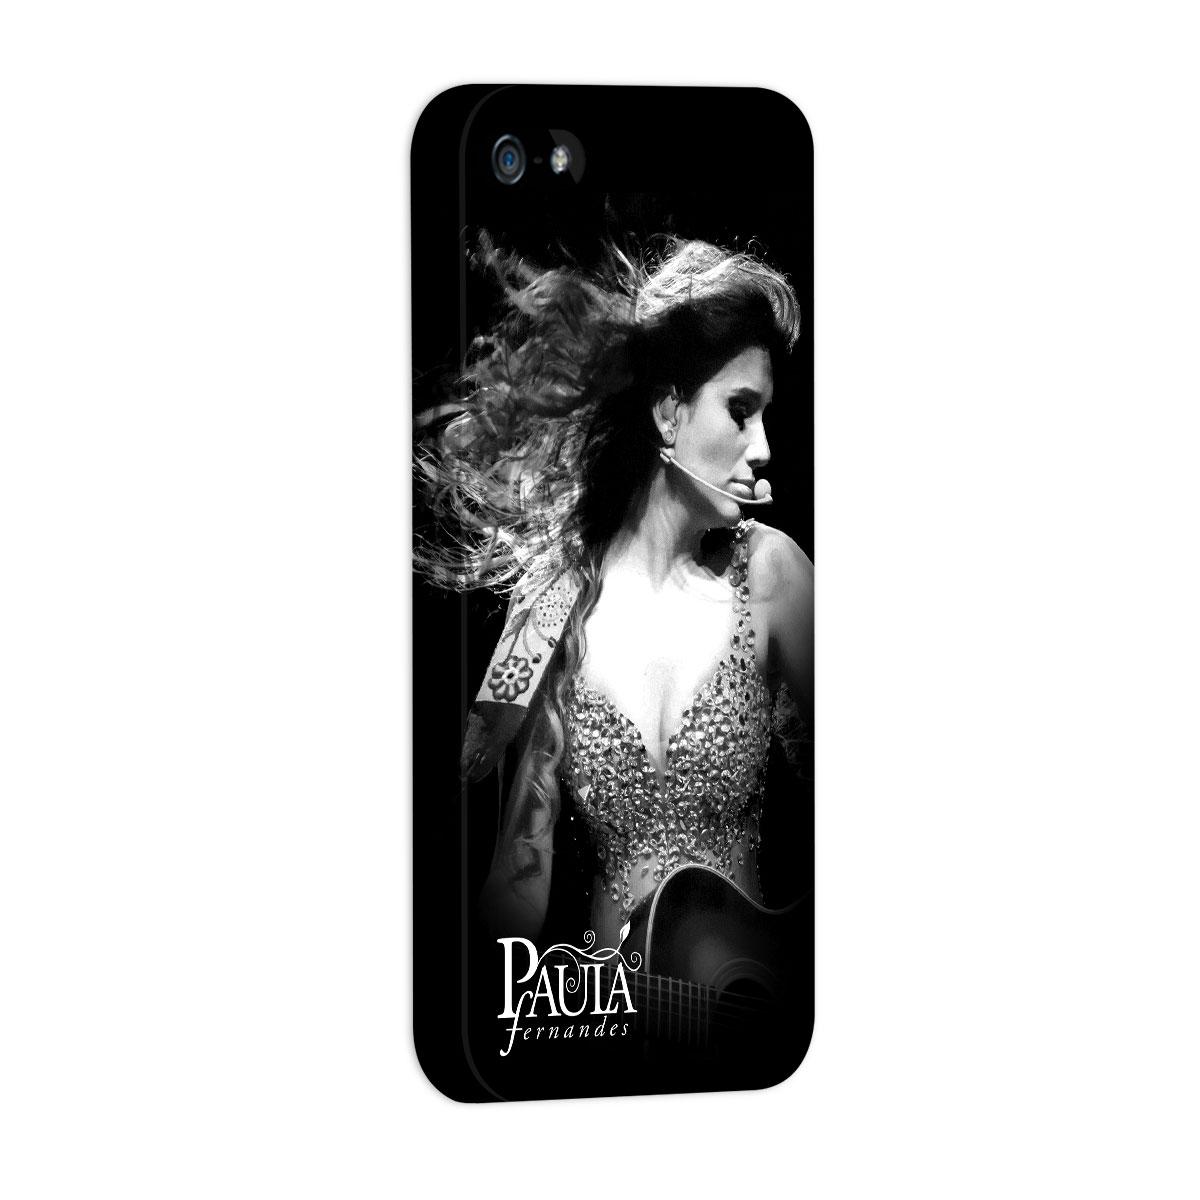 Capa para iPhone 5/5S Paula Fernandes Foto